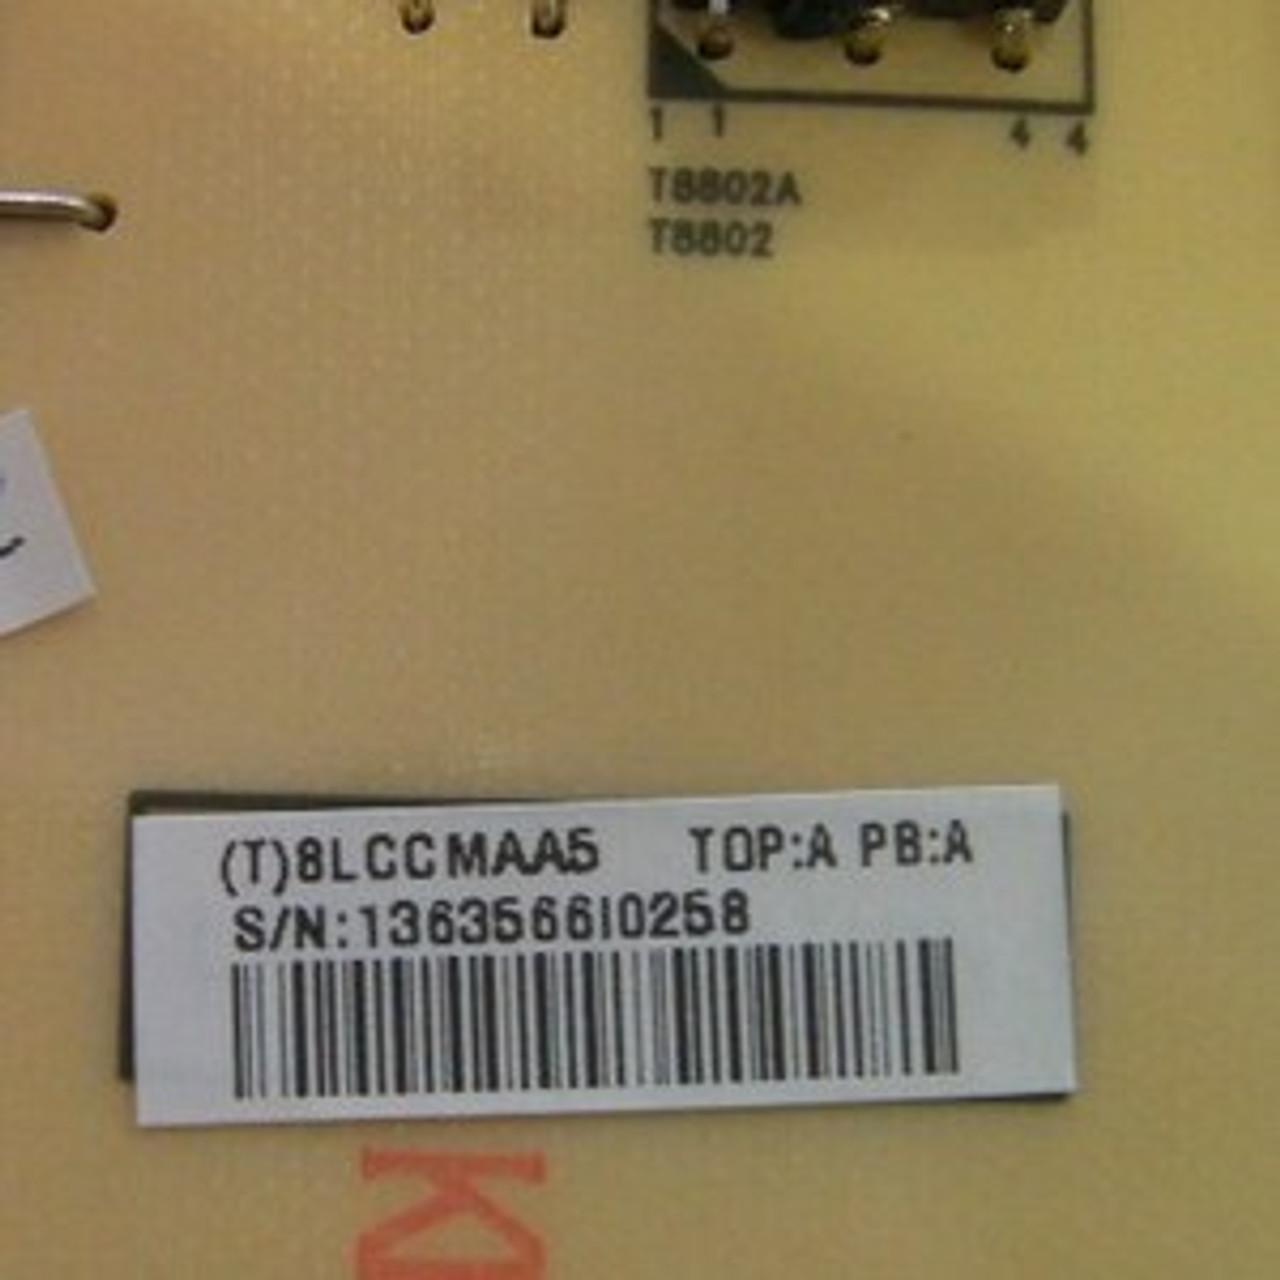 INSIGNIA NS-L32Q-10A INVERTER BOARD 715G3333-1 / INTV8LCCMAA5